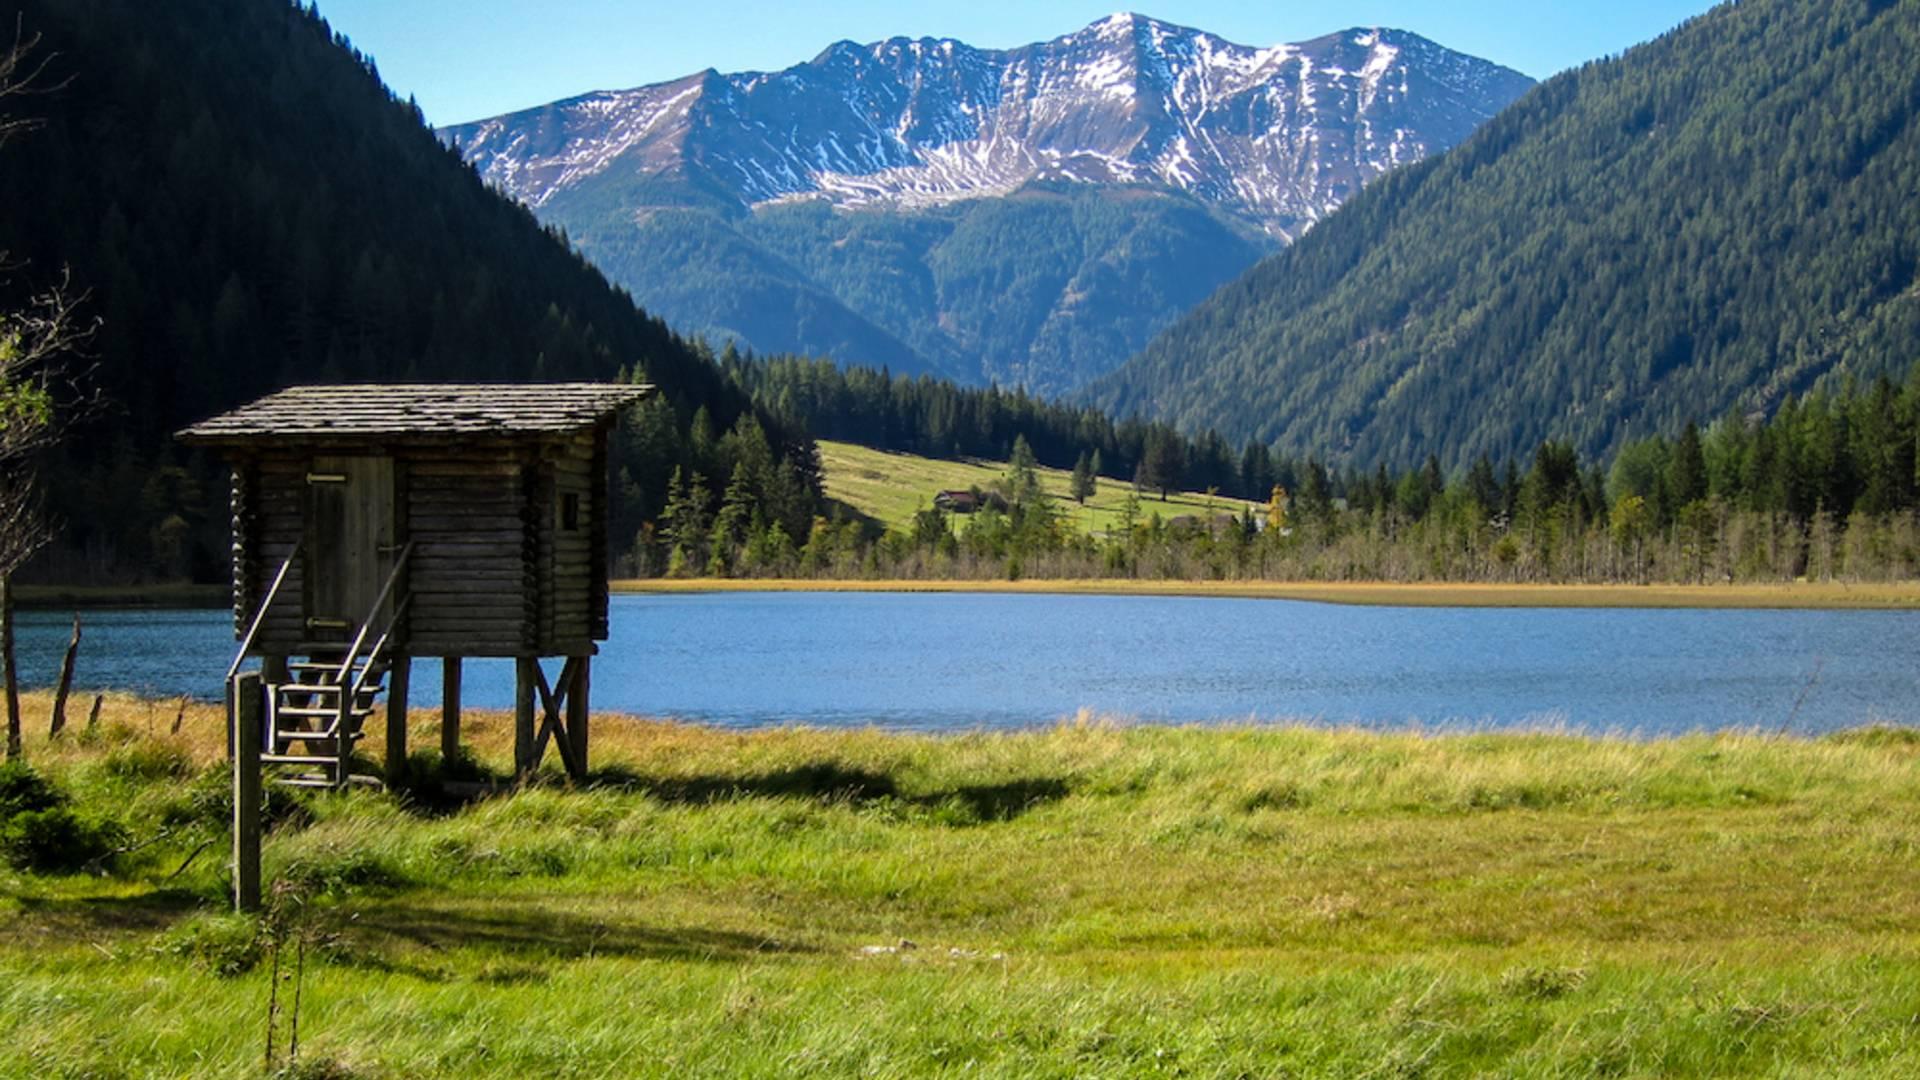 Alpe adria trail stappitzer see komprimiert